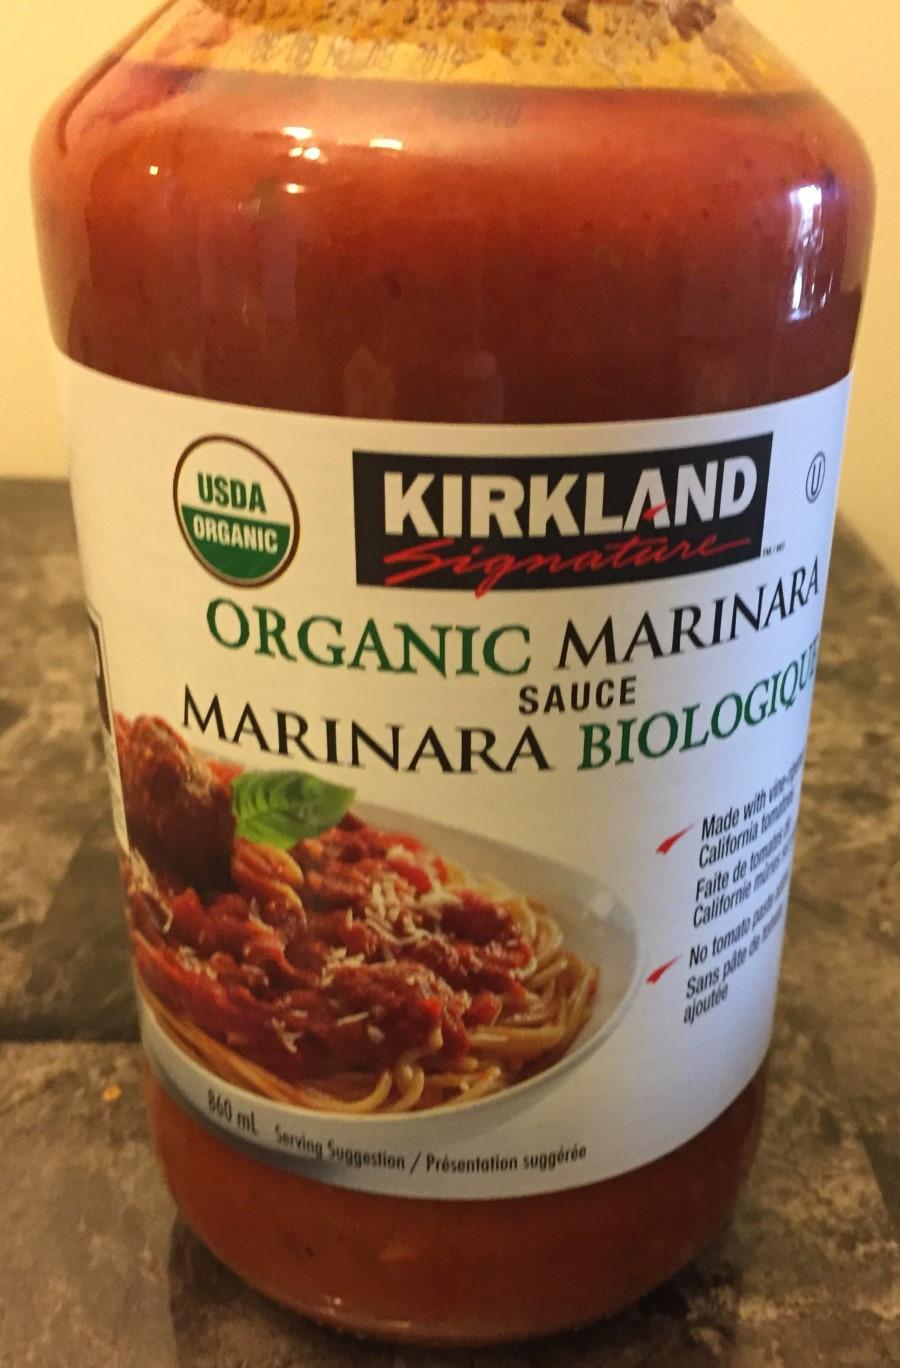 Costco Kirkland Signature Organic Marinara Sauce